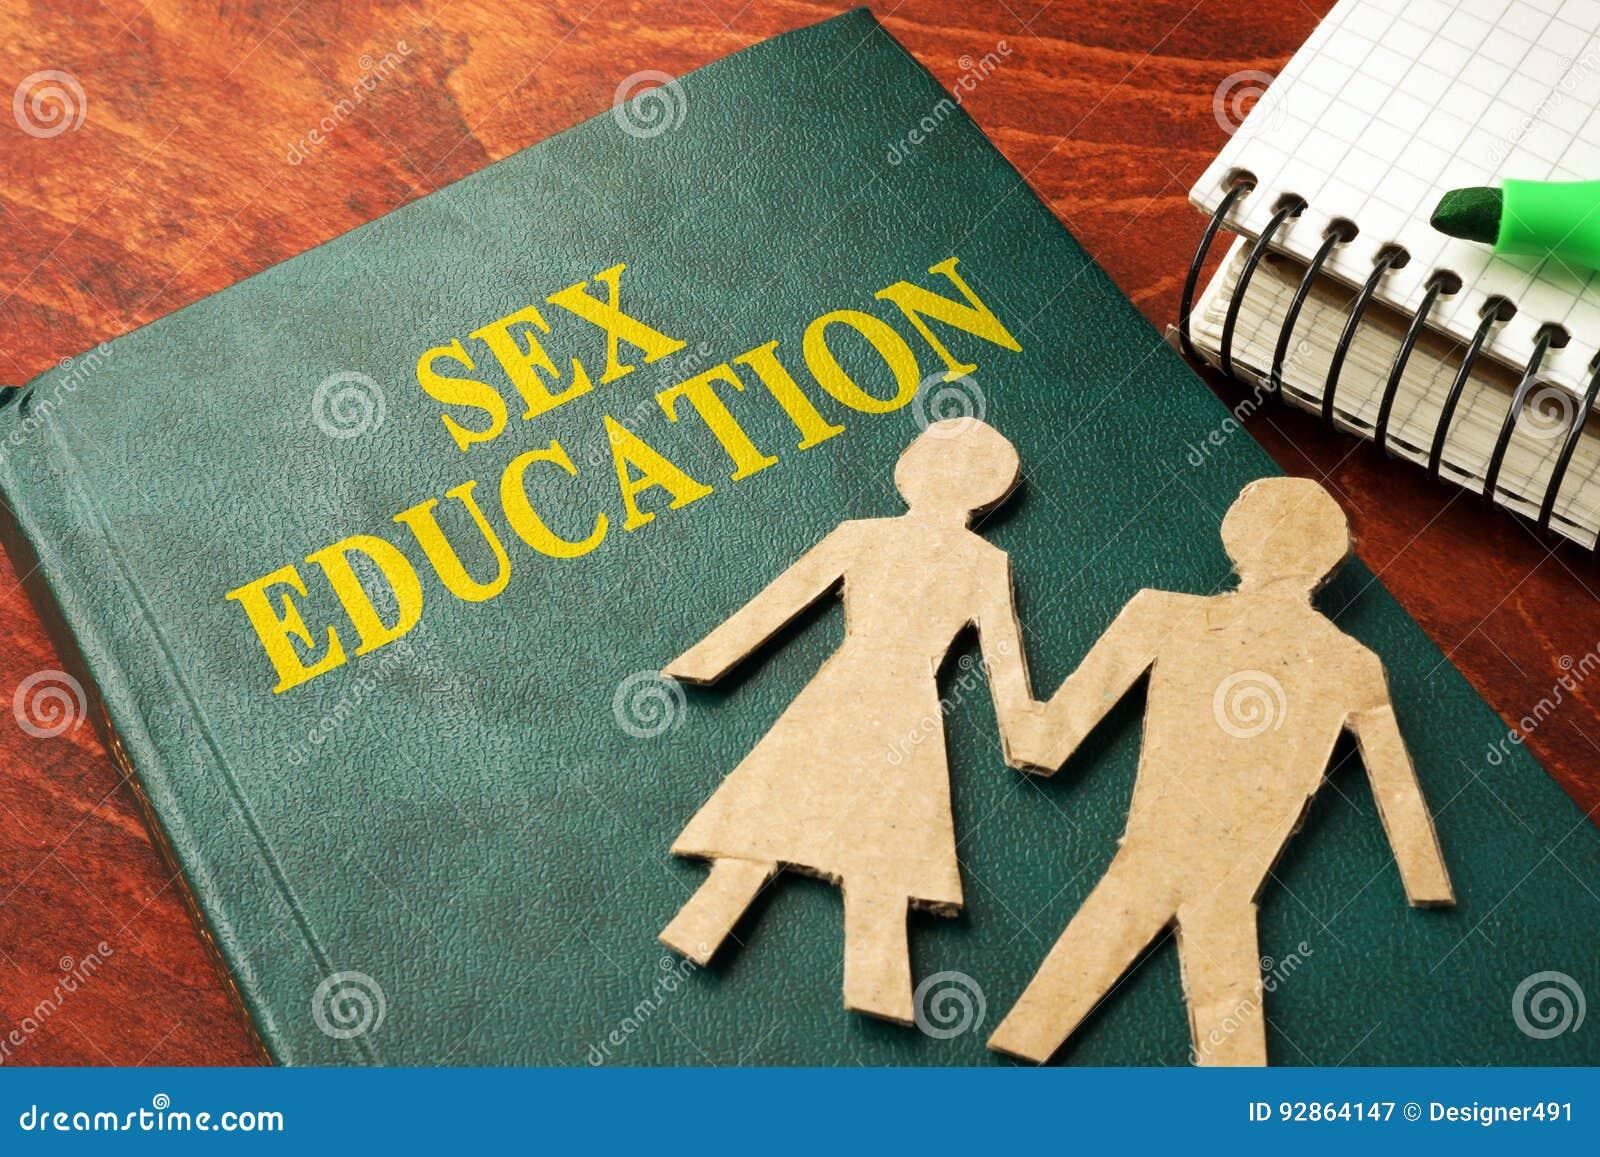 Boek met titelseksuele opvoeding